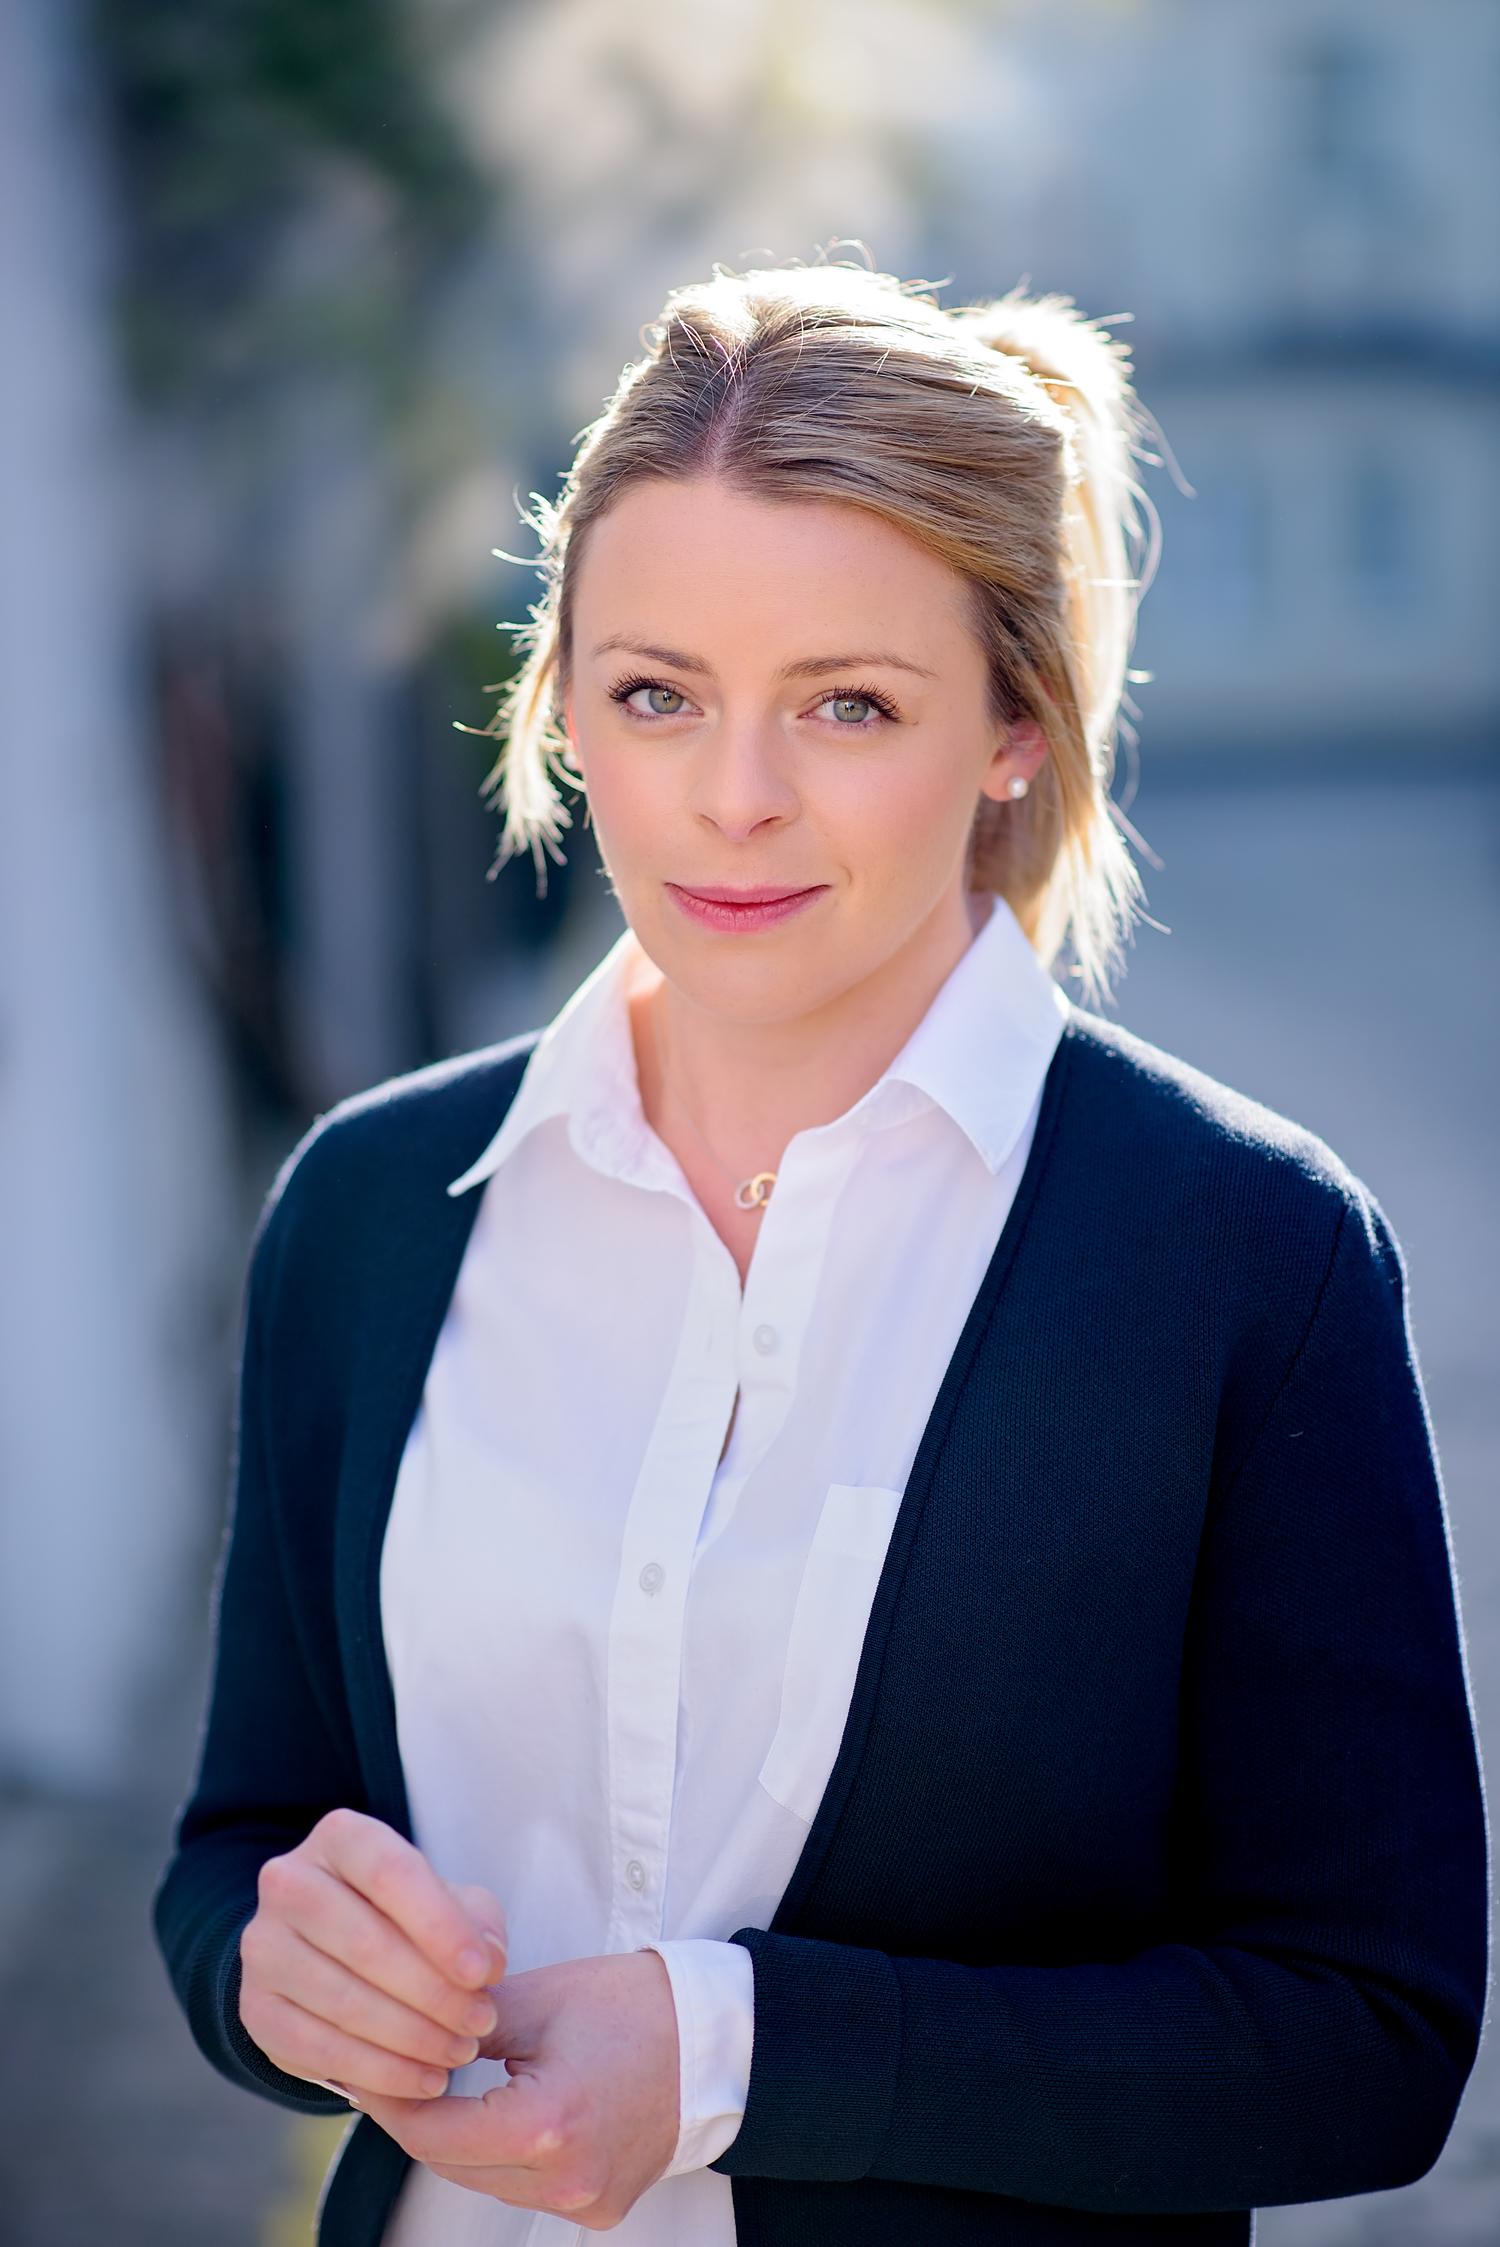 Nastya Malikova - hire at Ithire